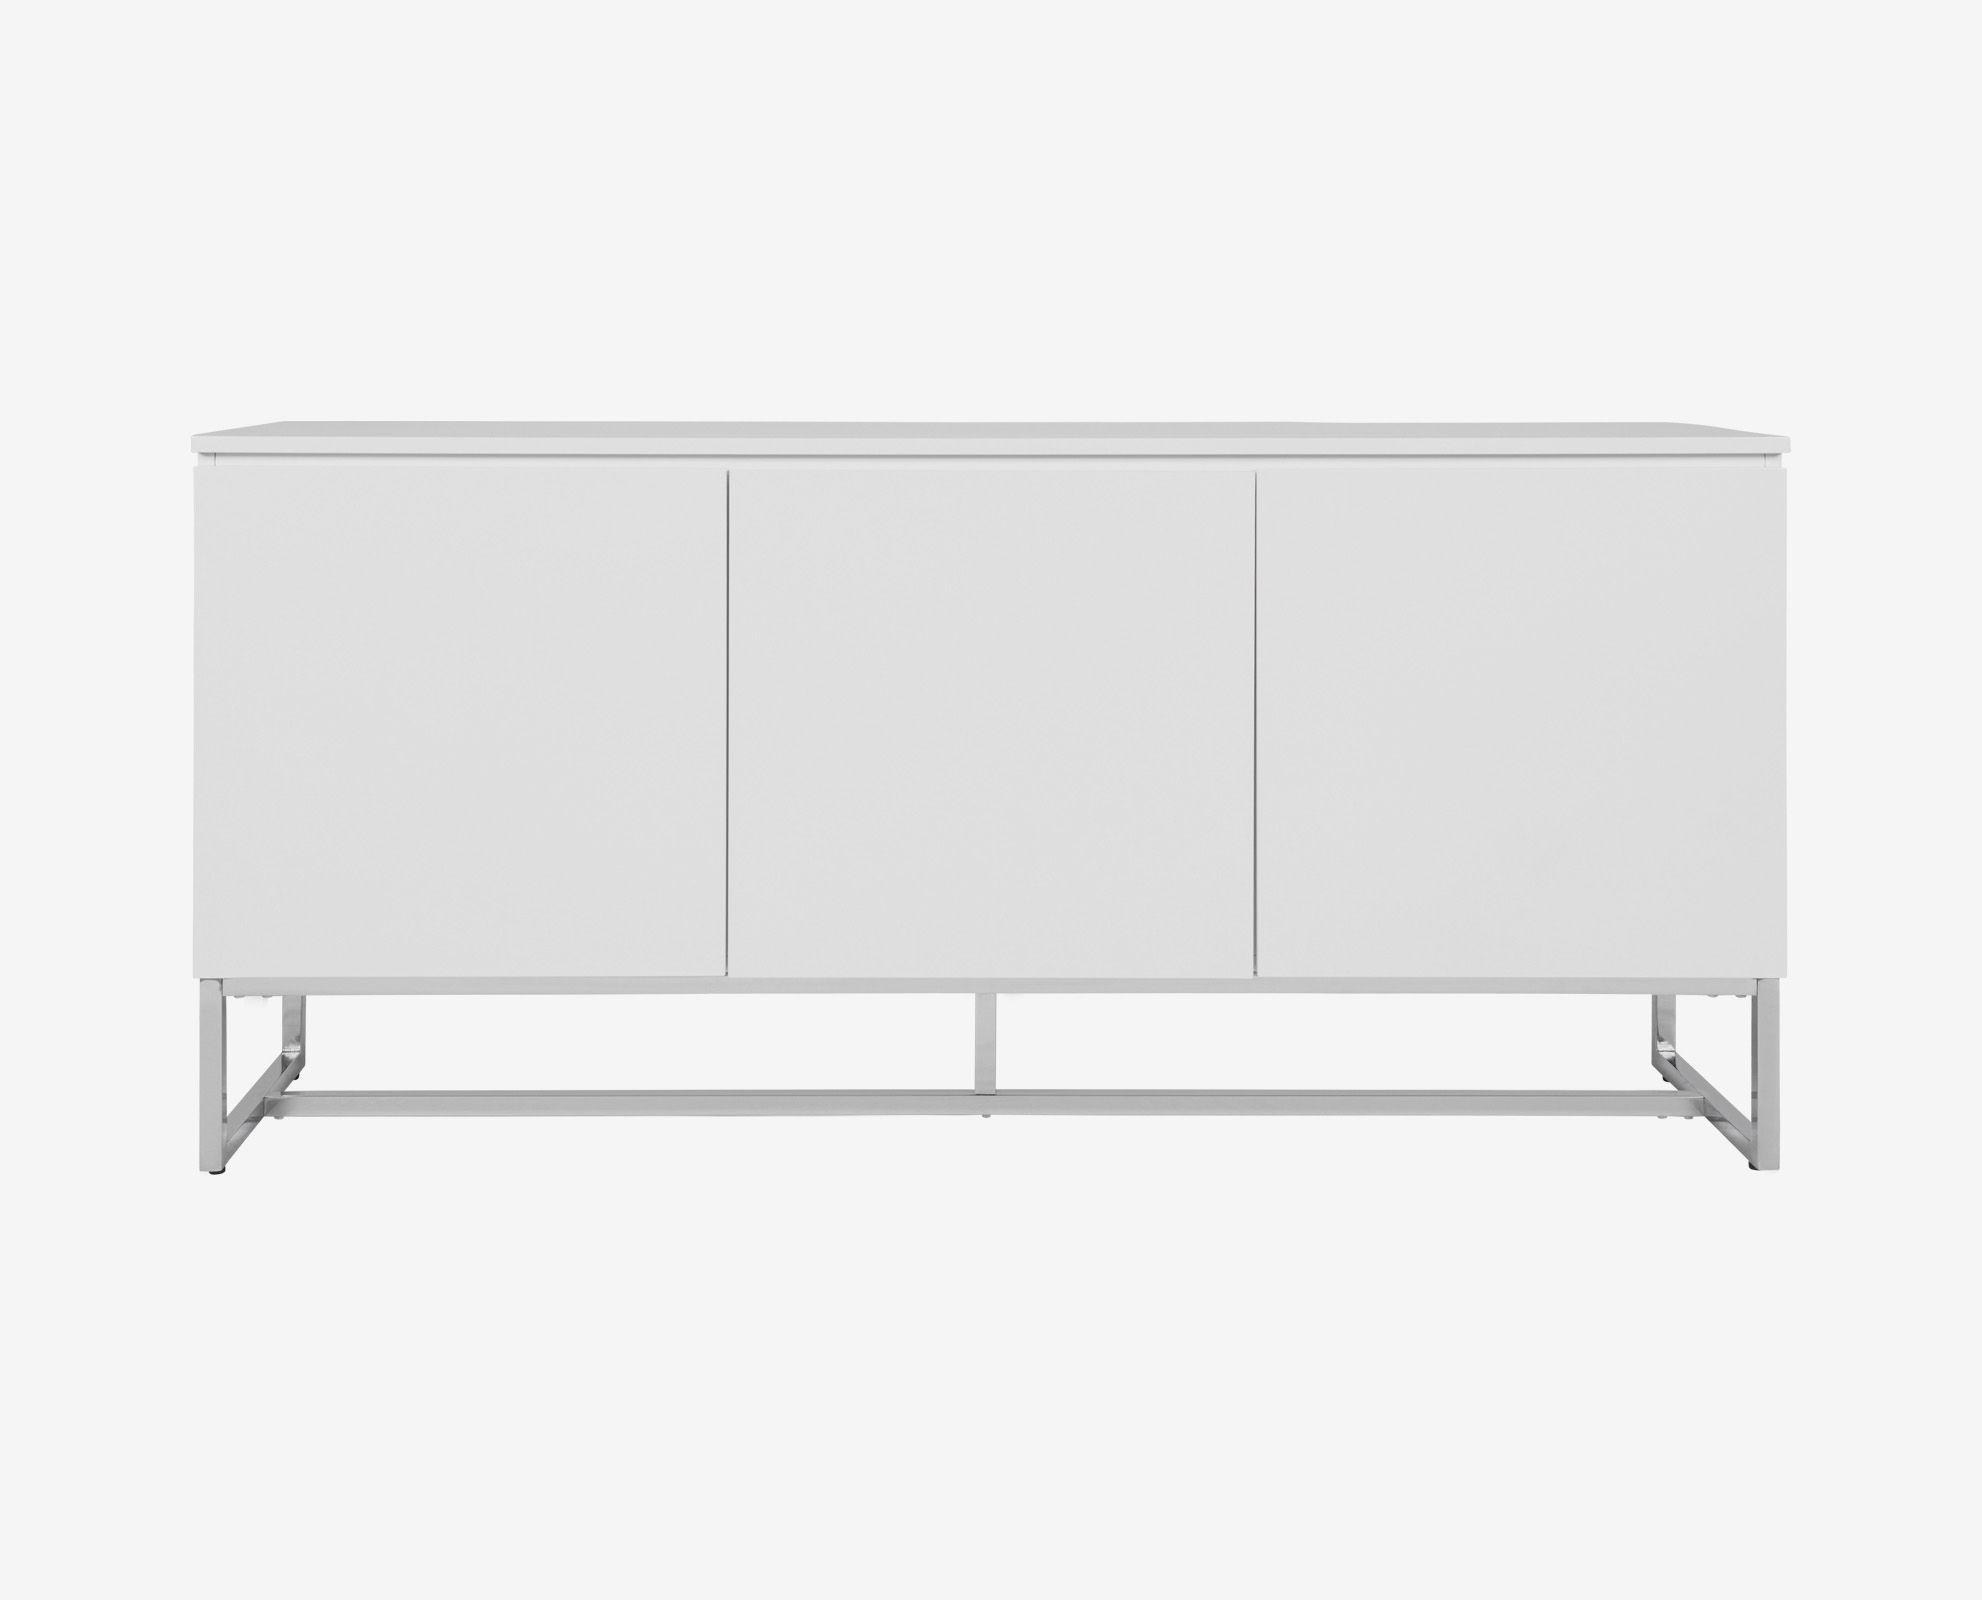 white office credenza. Office Furniture. Scandinavian OfficeWhite CabinetsGtaCredenzaOffice White Credenza L